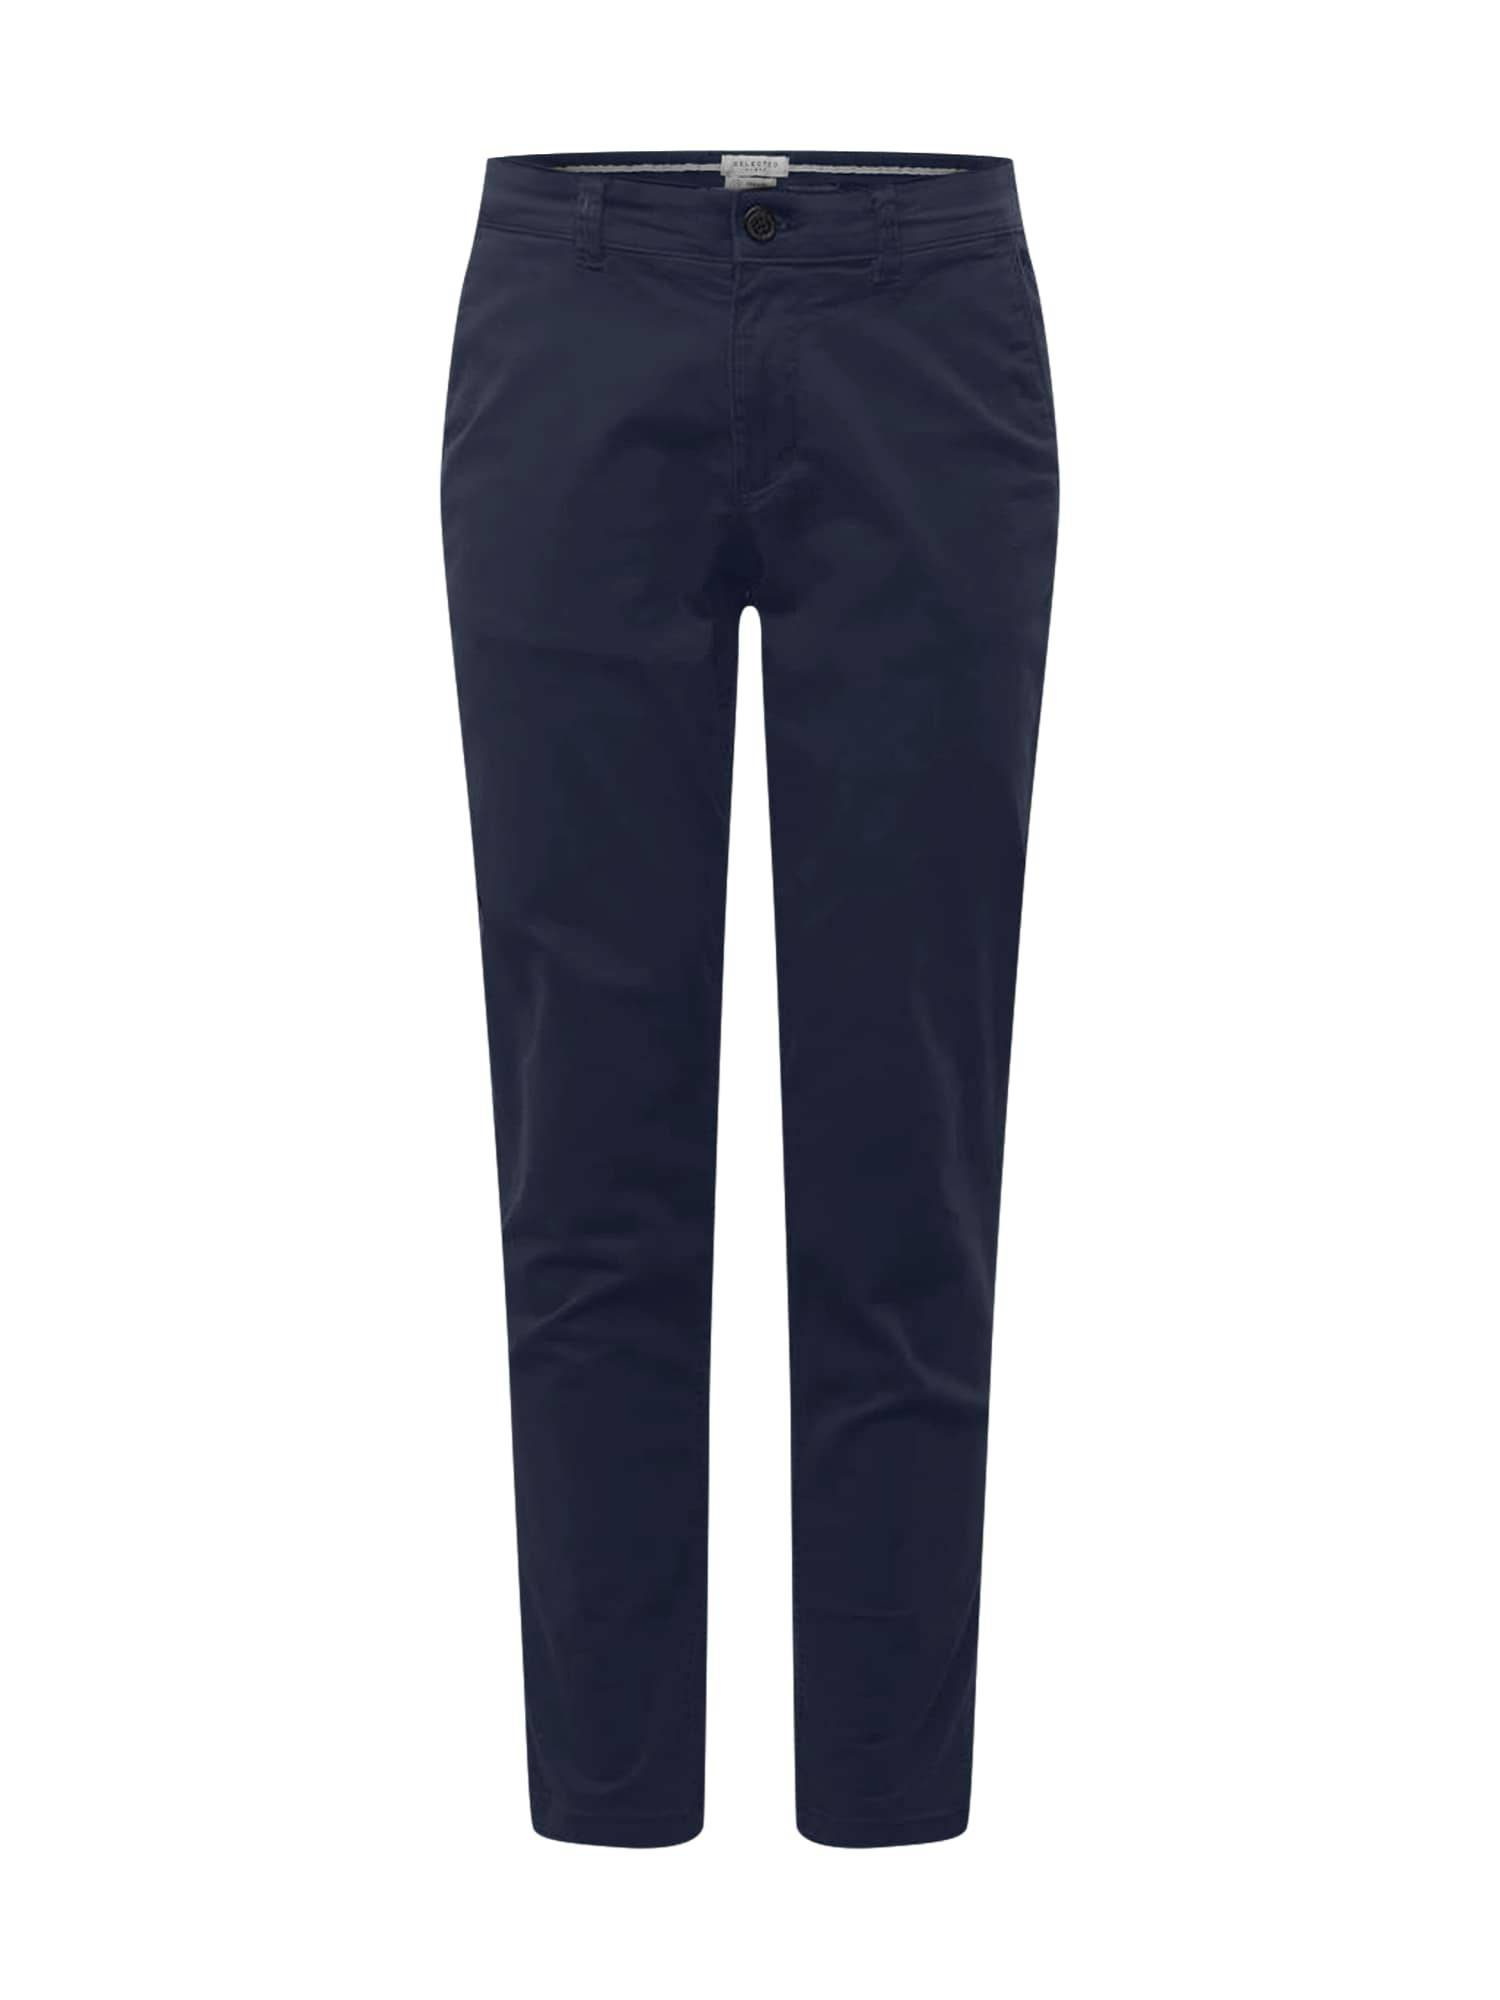 SELECTED HOMME Pantalon chino 'NEW PARIS'  - Bleu - Taille: 31 - male